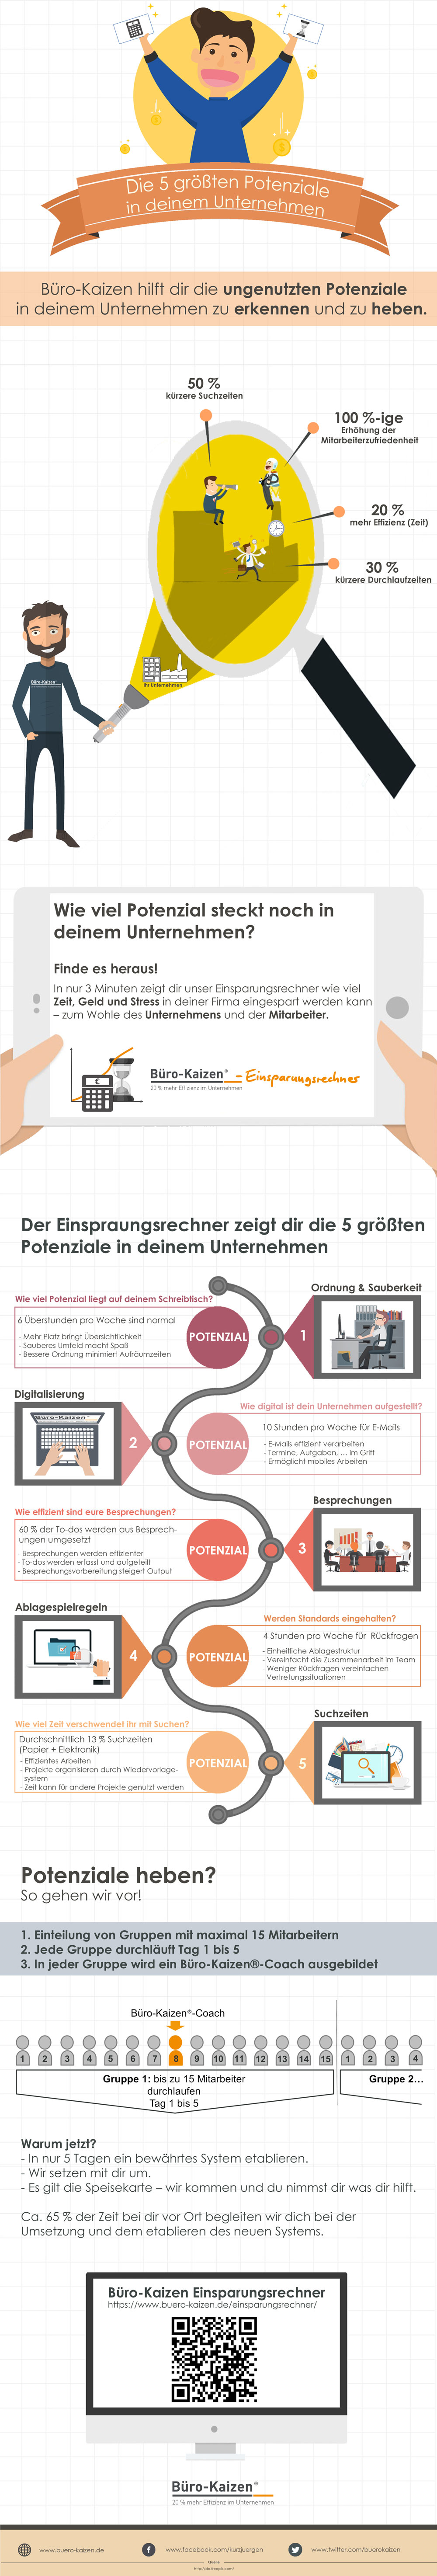 infografik-potenziale-im-unternehmen